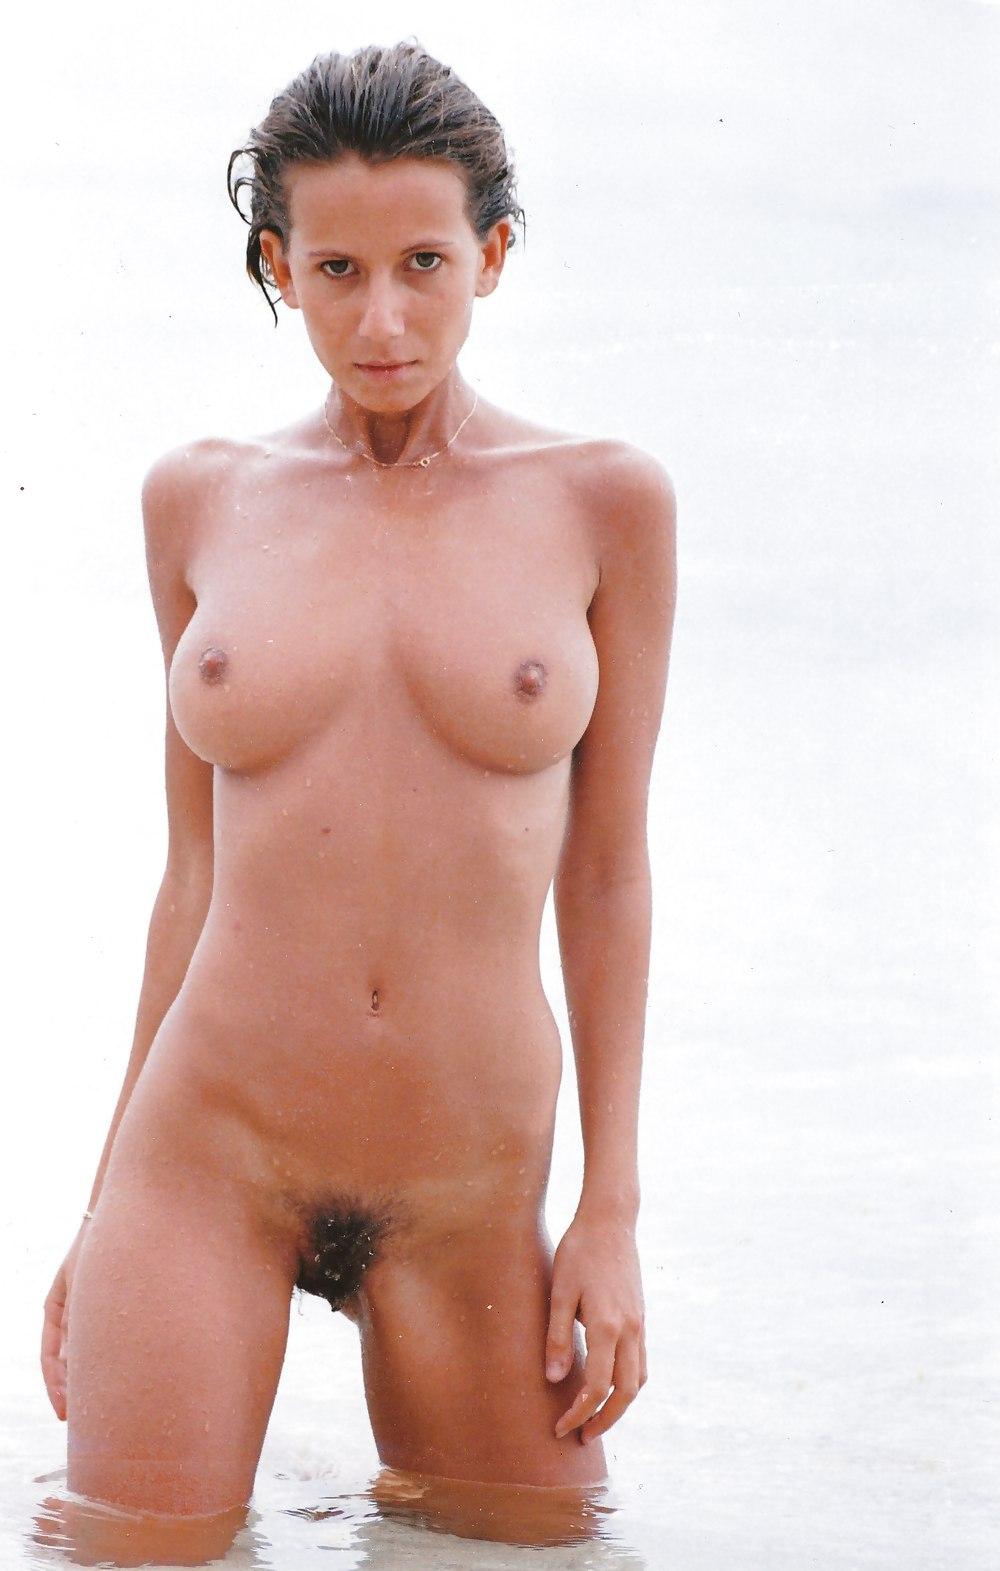 Fiona fullerton hot nude